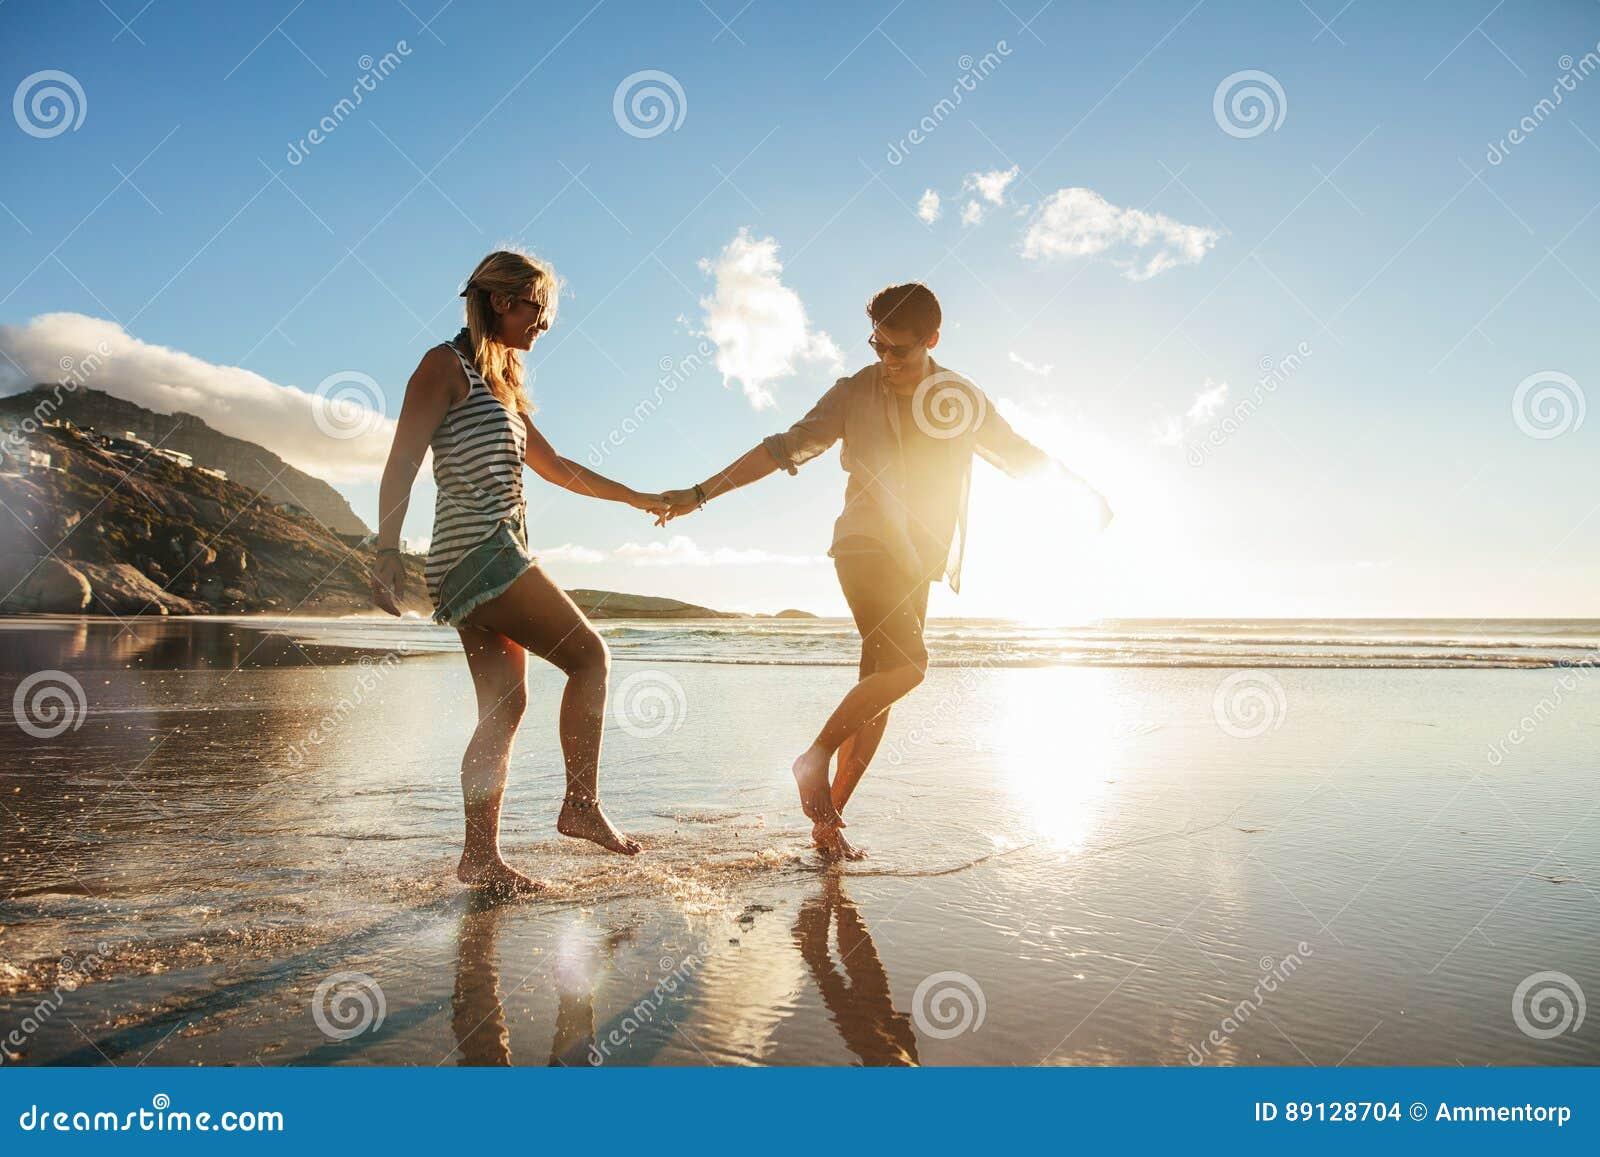 Young couple enjoying holidays on the sea shore